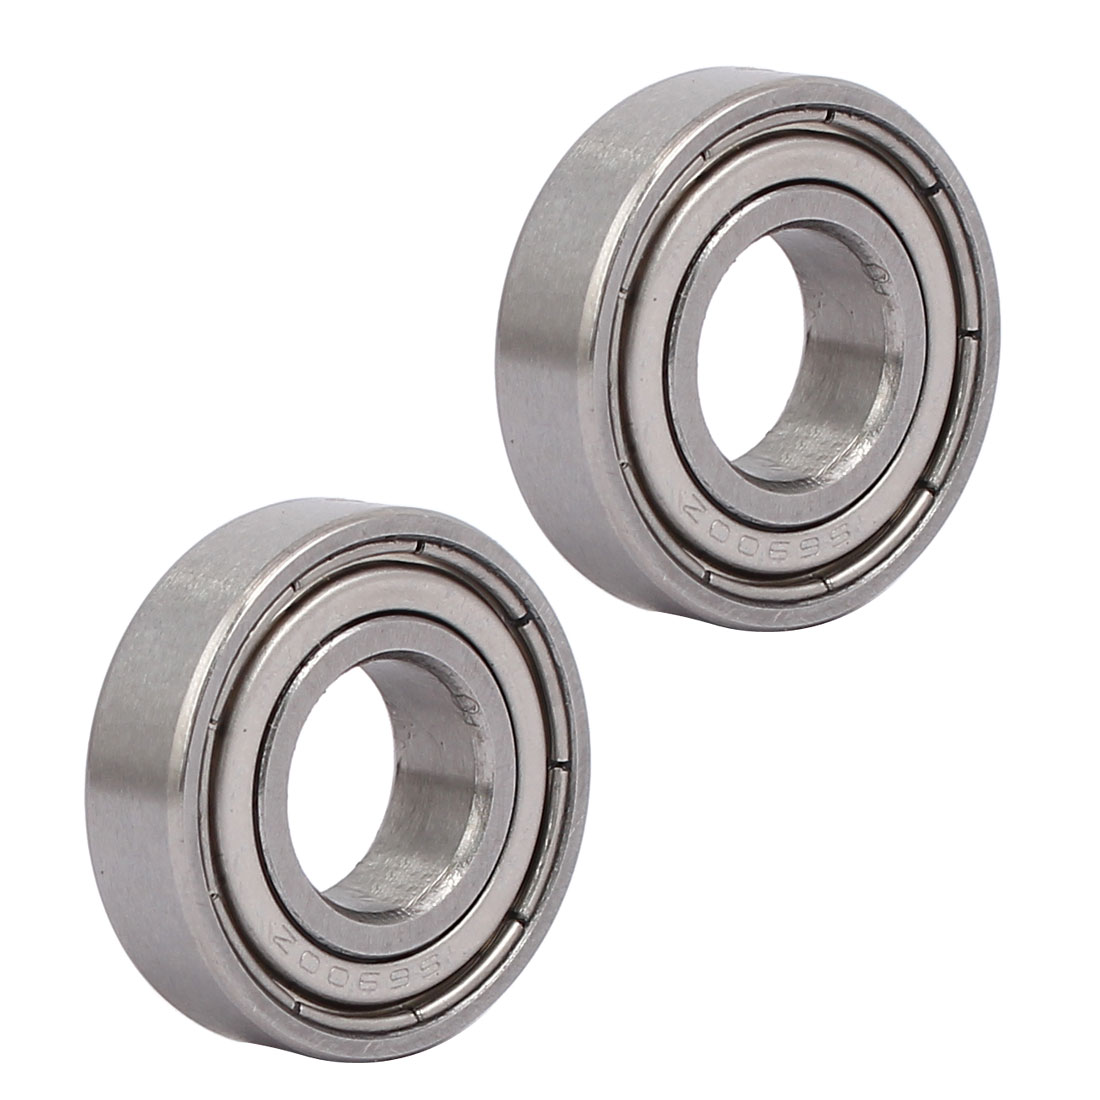 22mmx10mmx6mm 6900 Stainless Steel Shielded Deep Groove Ball Bearing 2pcs